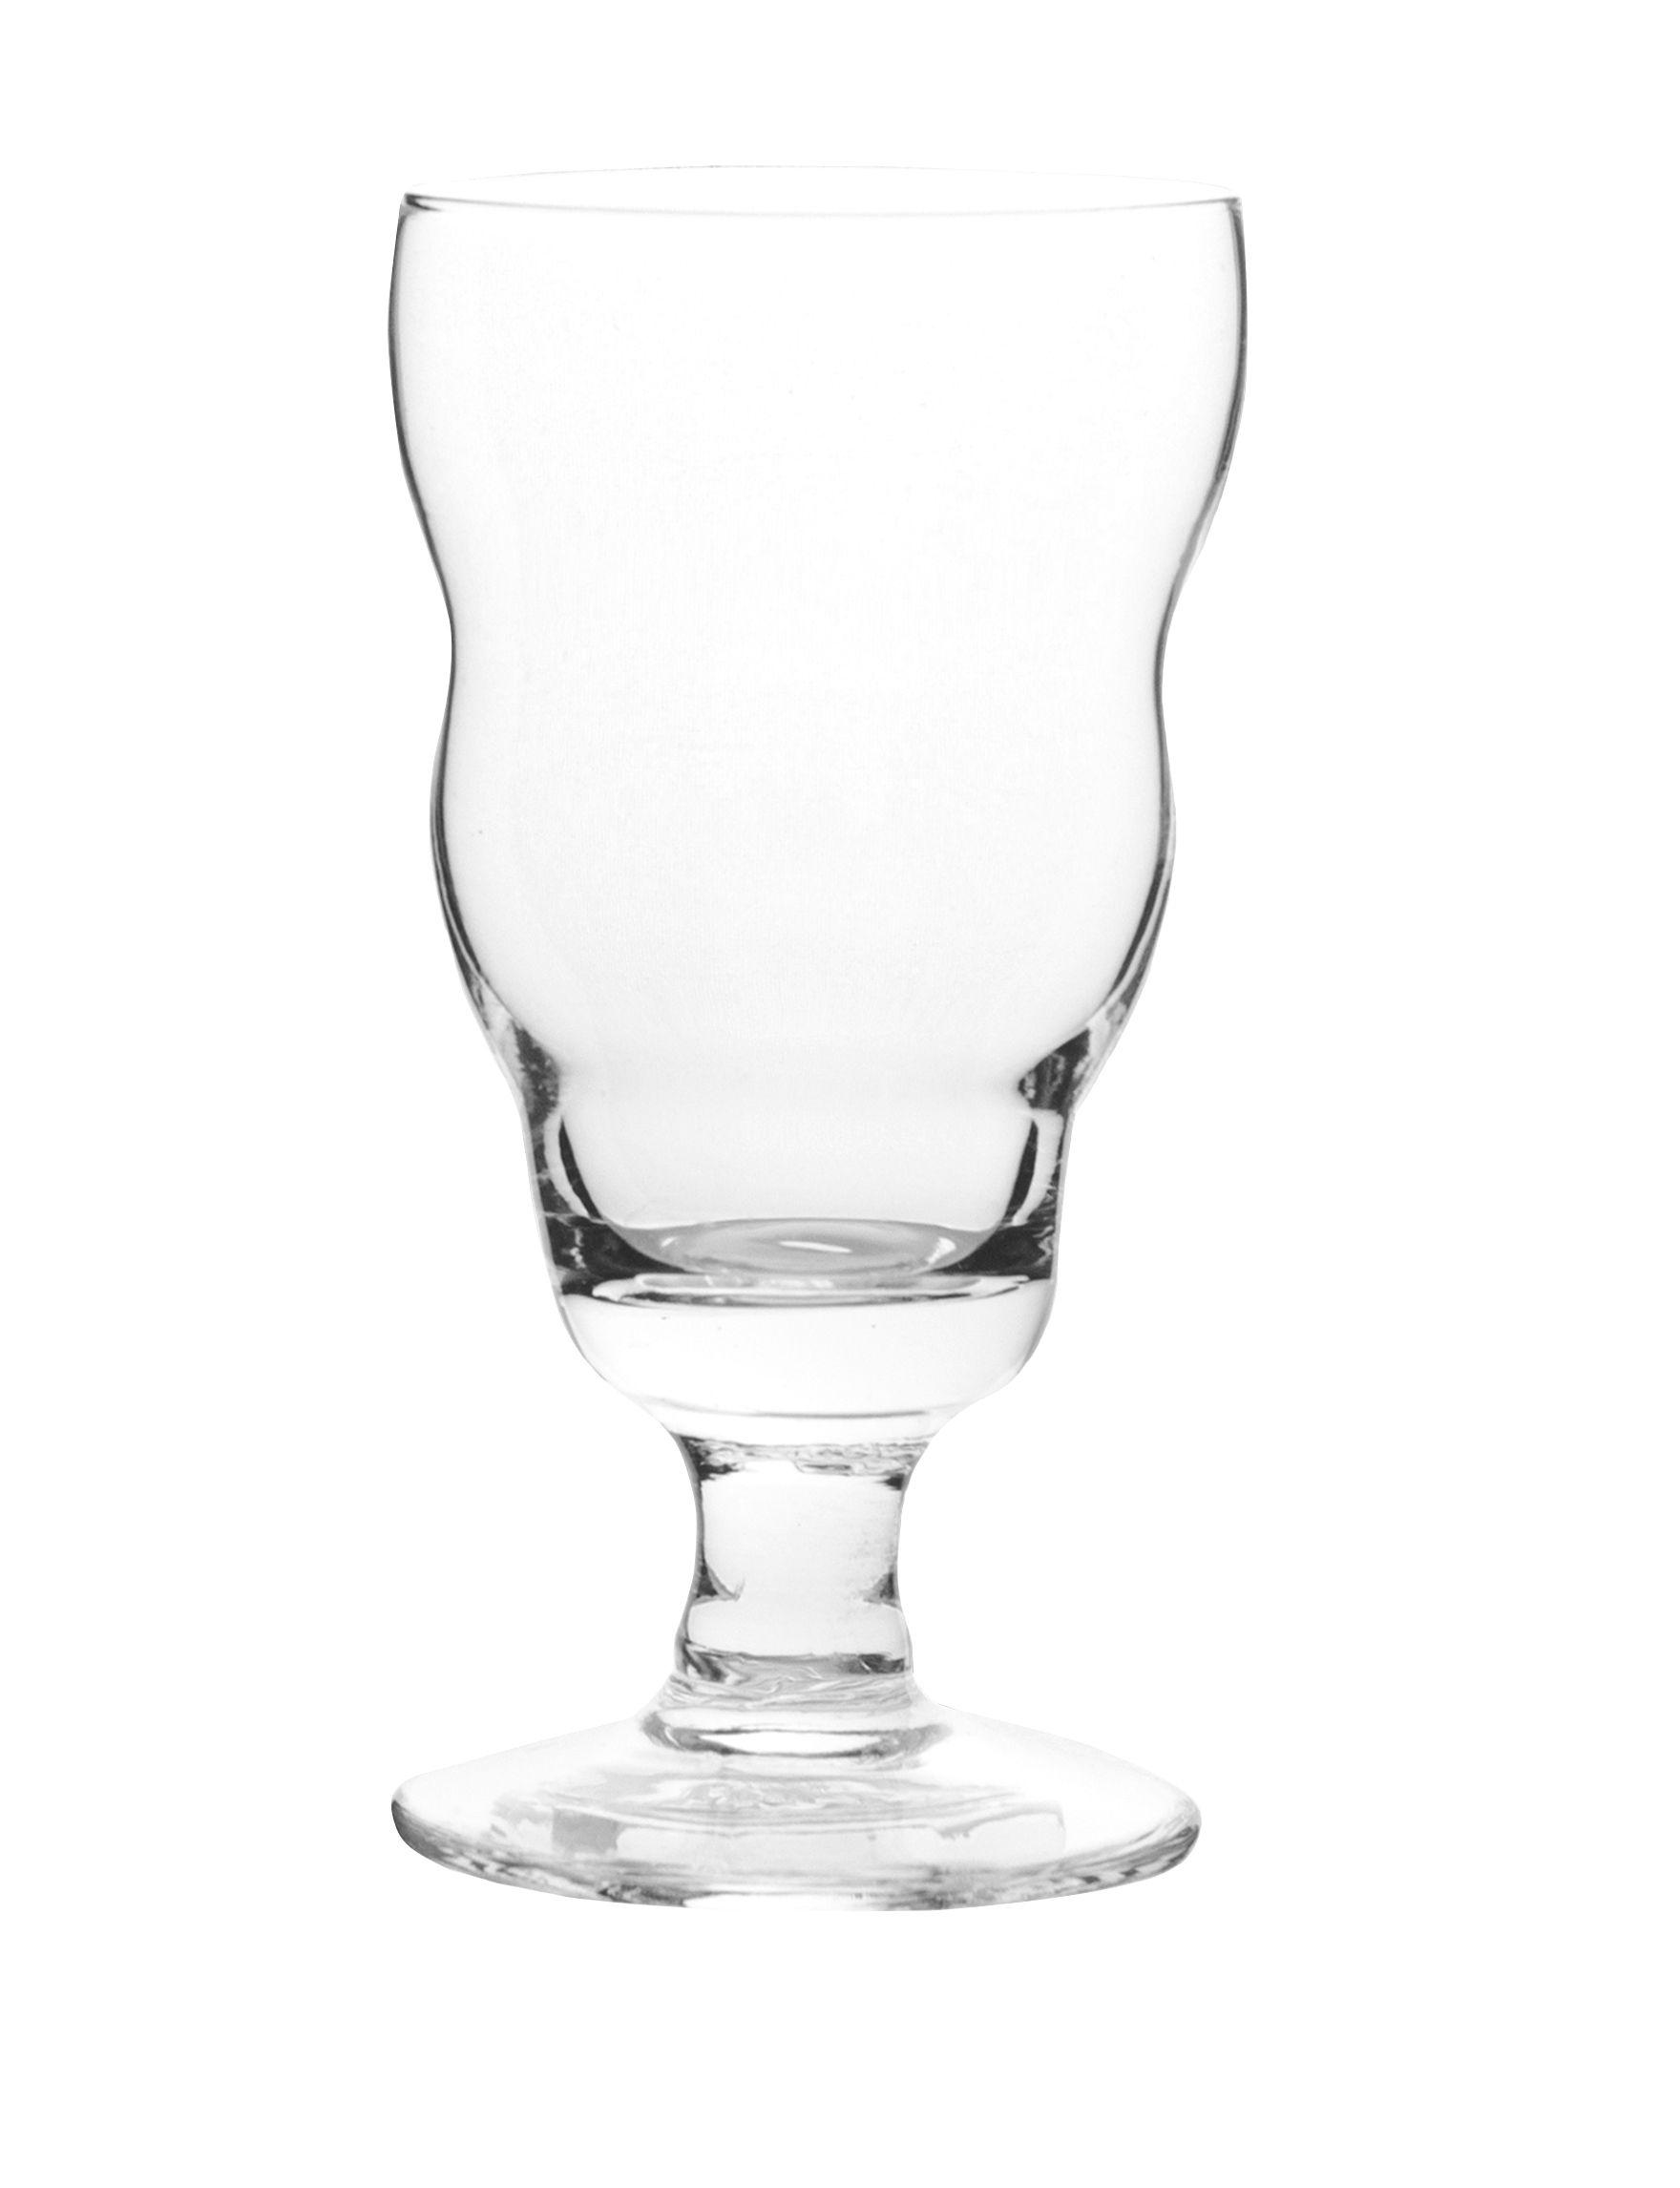 10 Strawberry Street Silver Cocktail & Liquor Glasses Drinkware